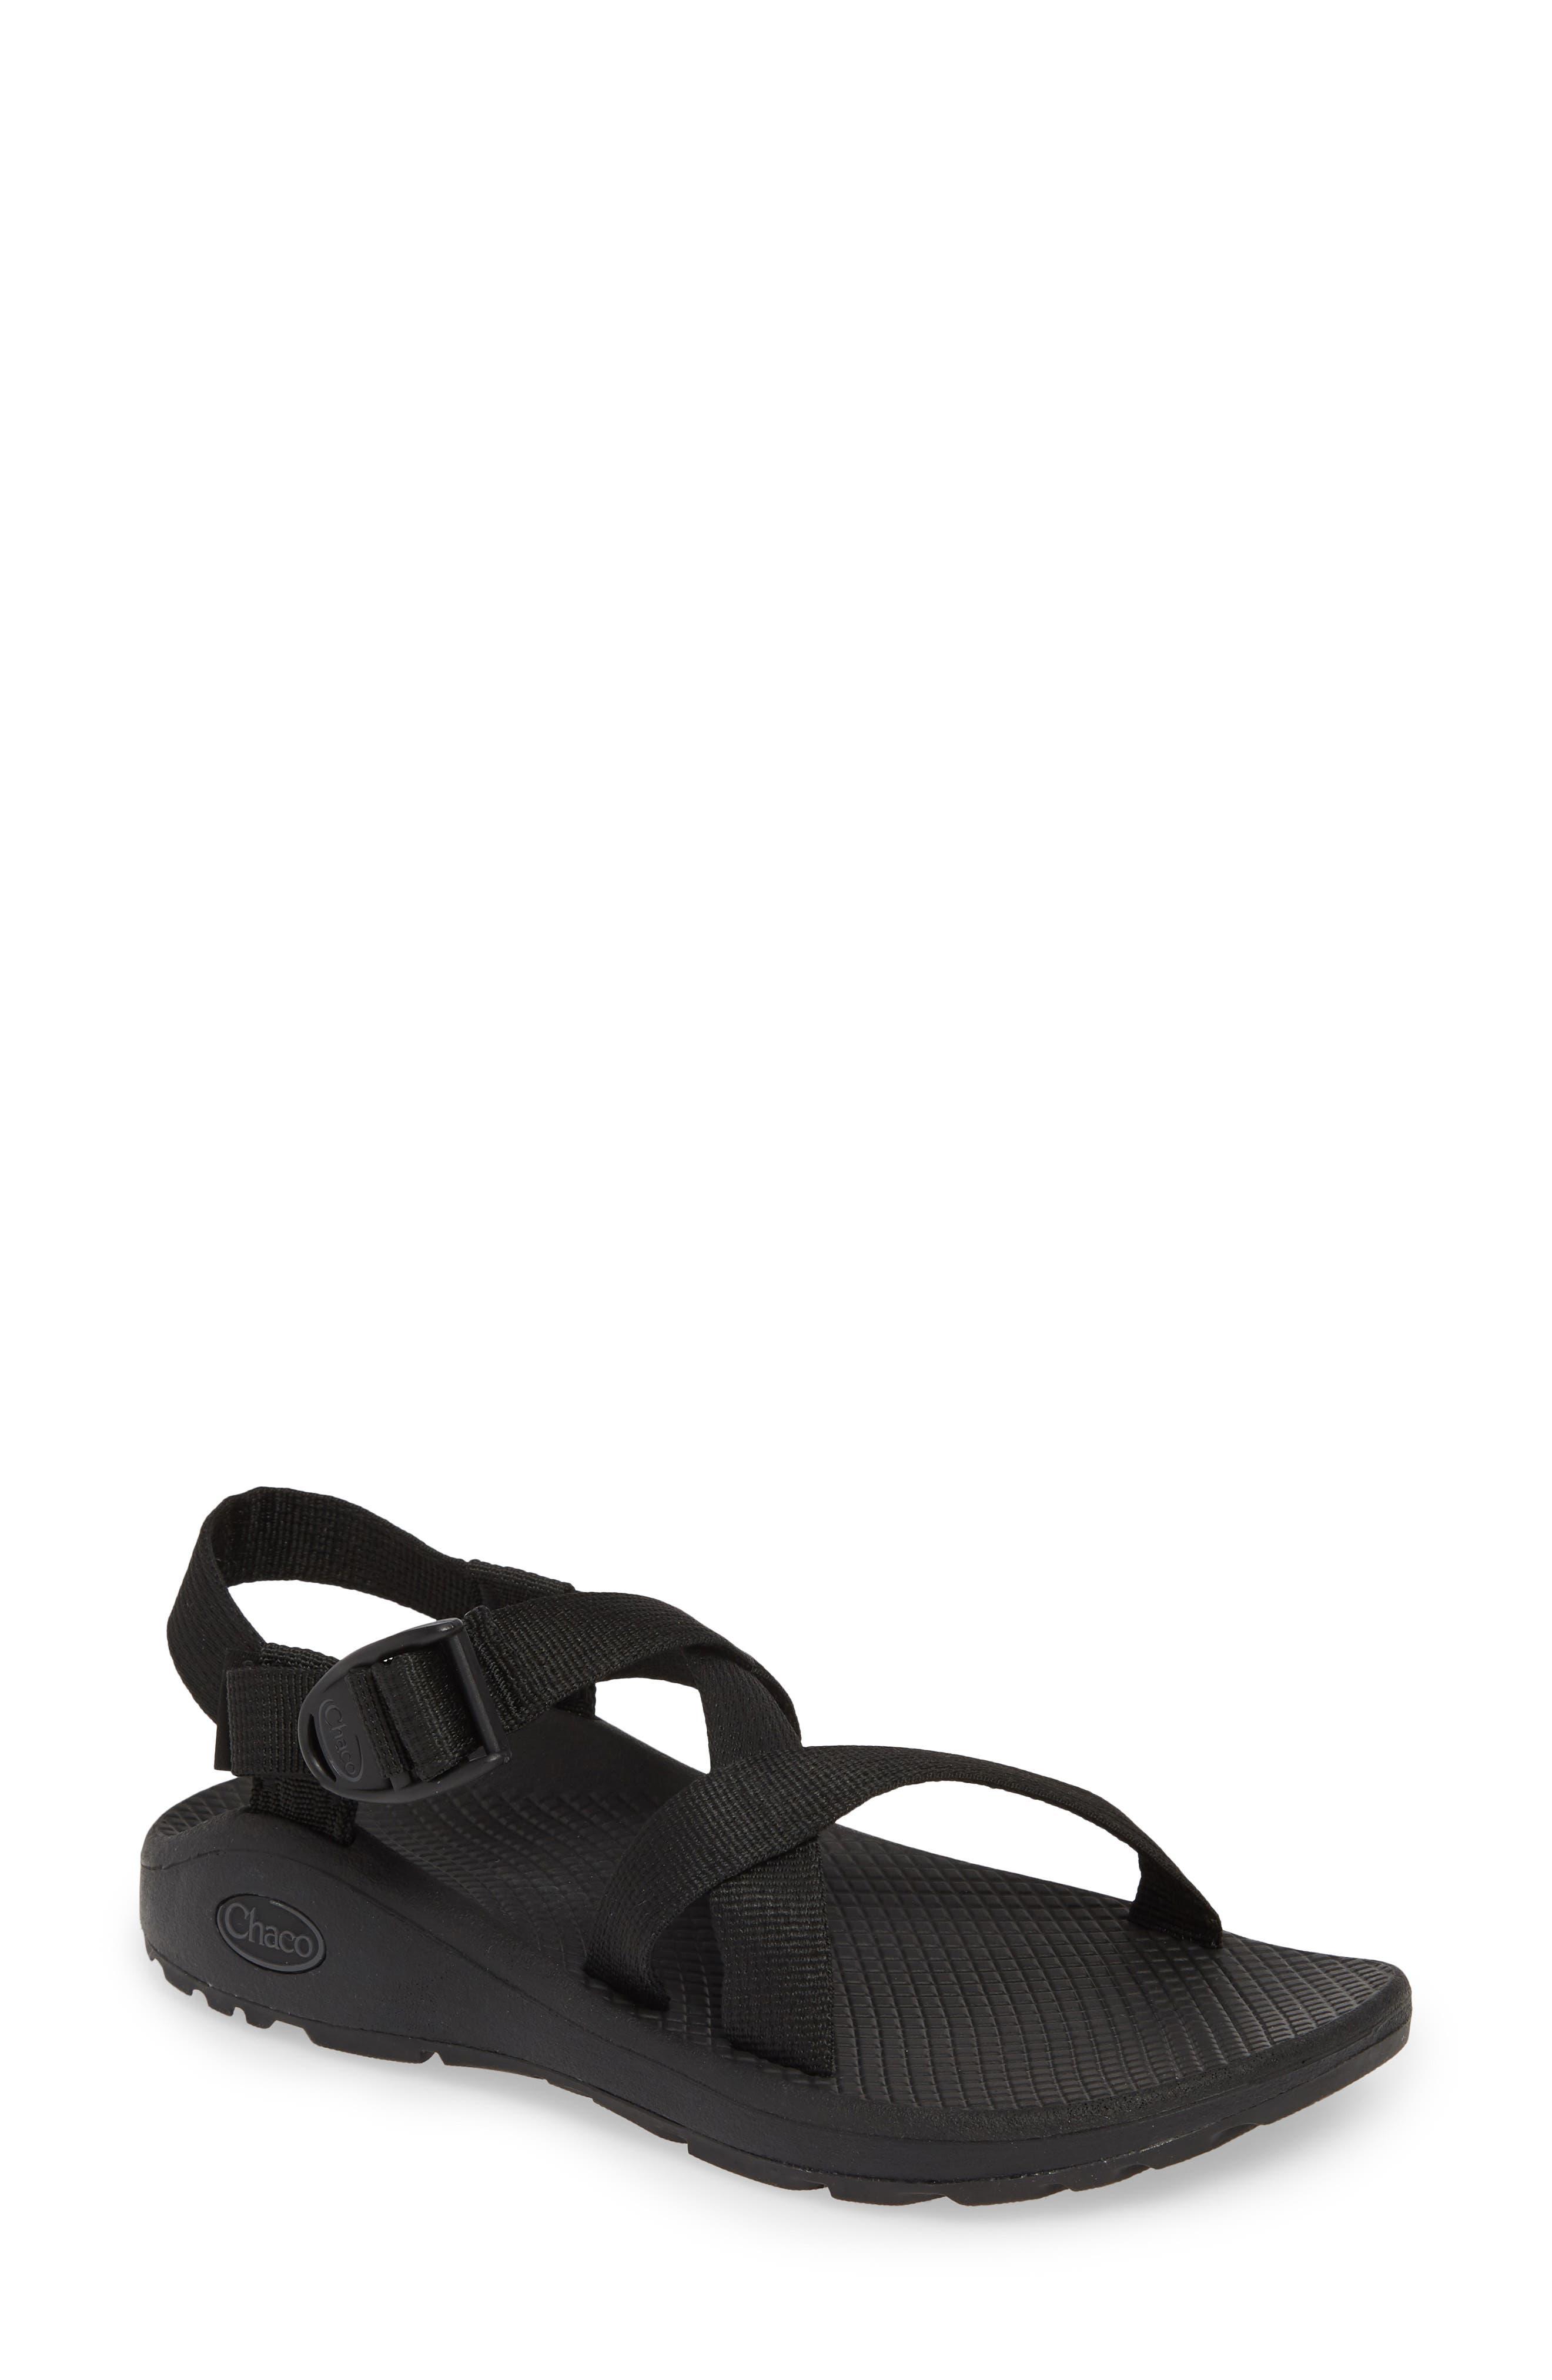 630d2454a0060 Women's Boat Shoes Shoes | Nordstrom